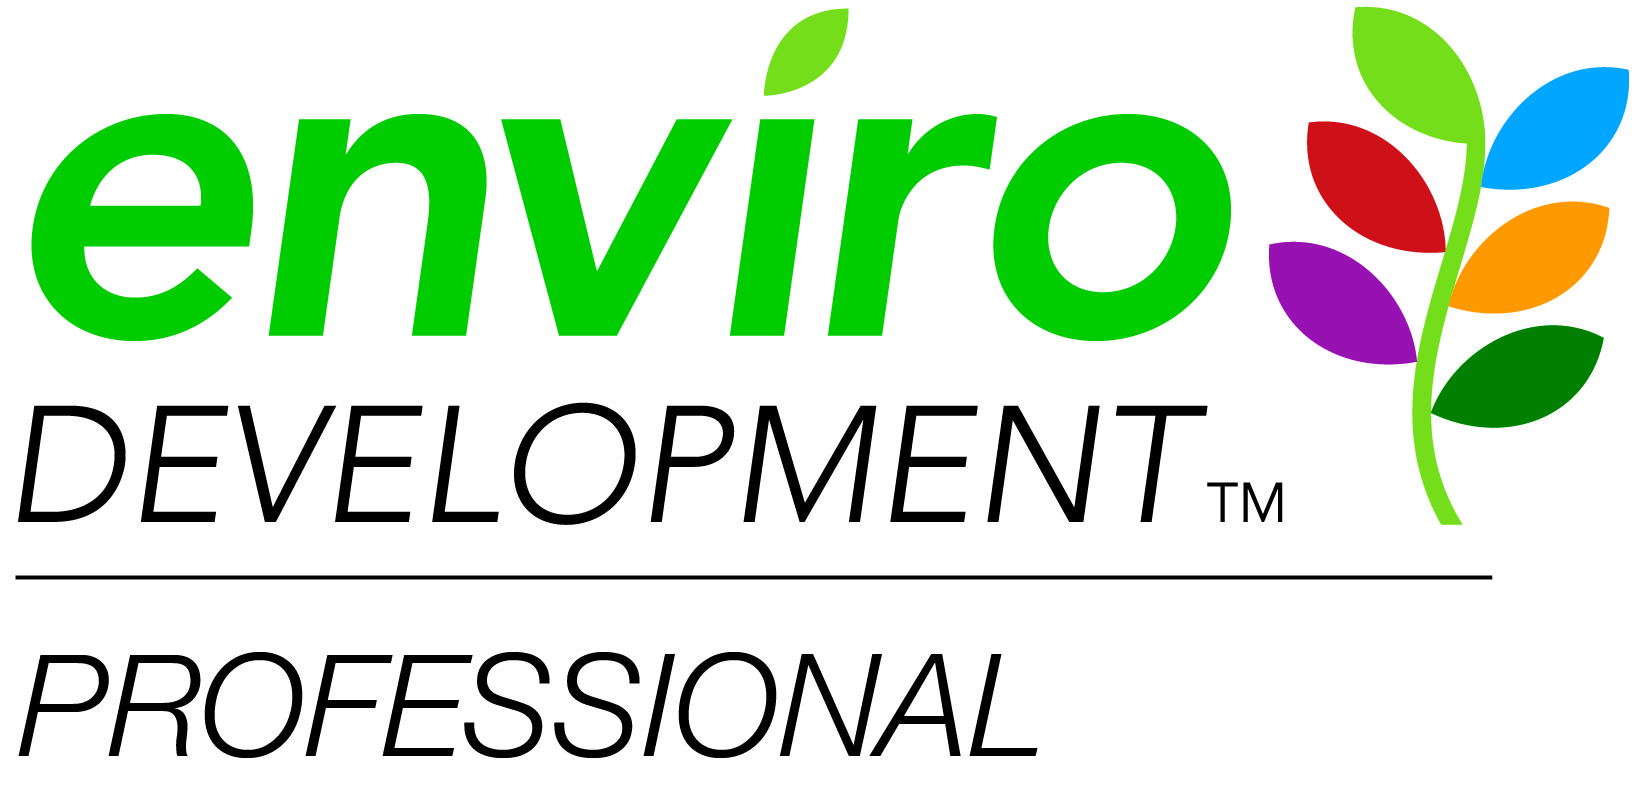 envirodevelopment professional